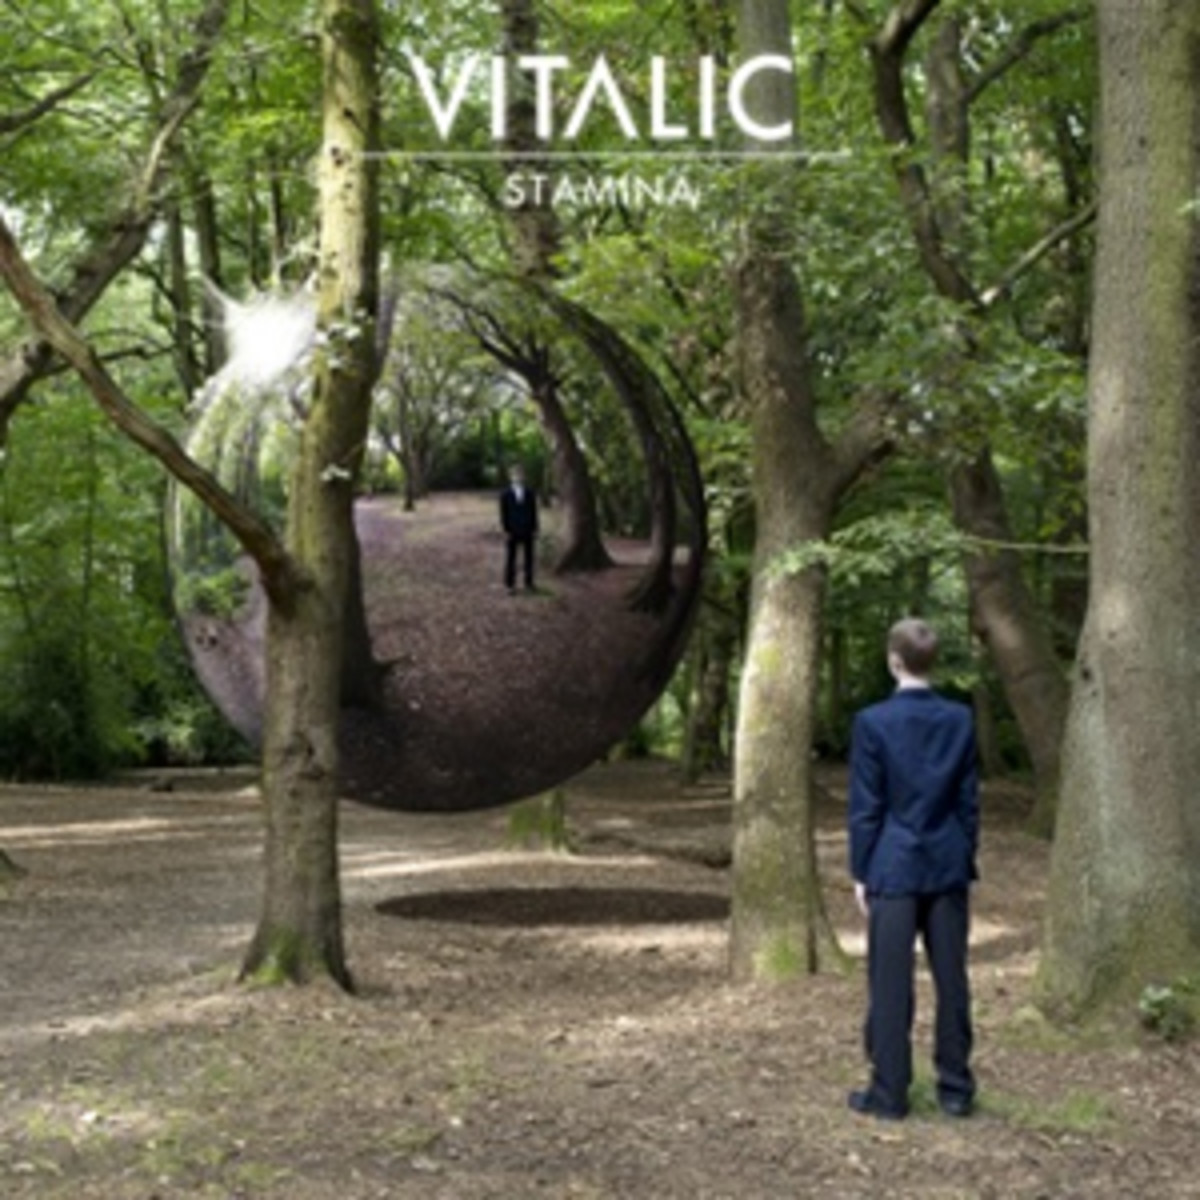 VITALIC_STAMINA_web